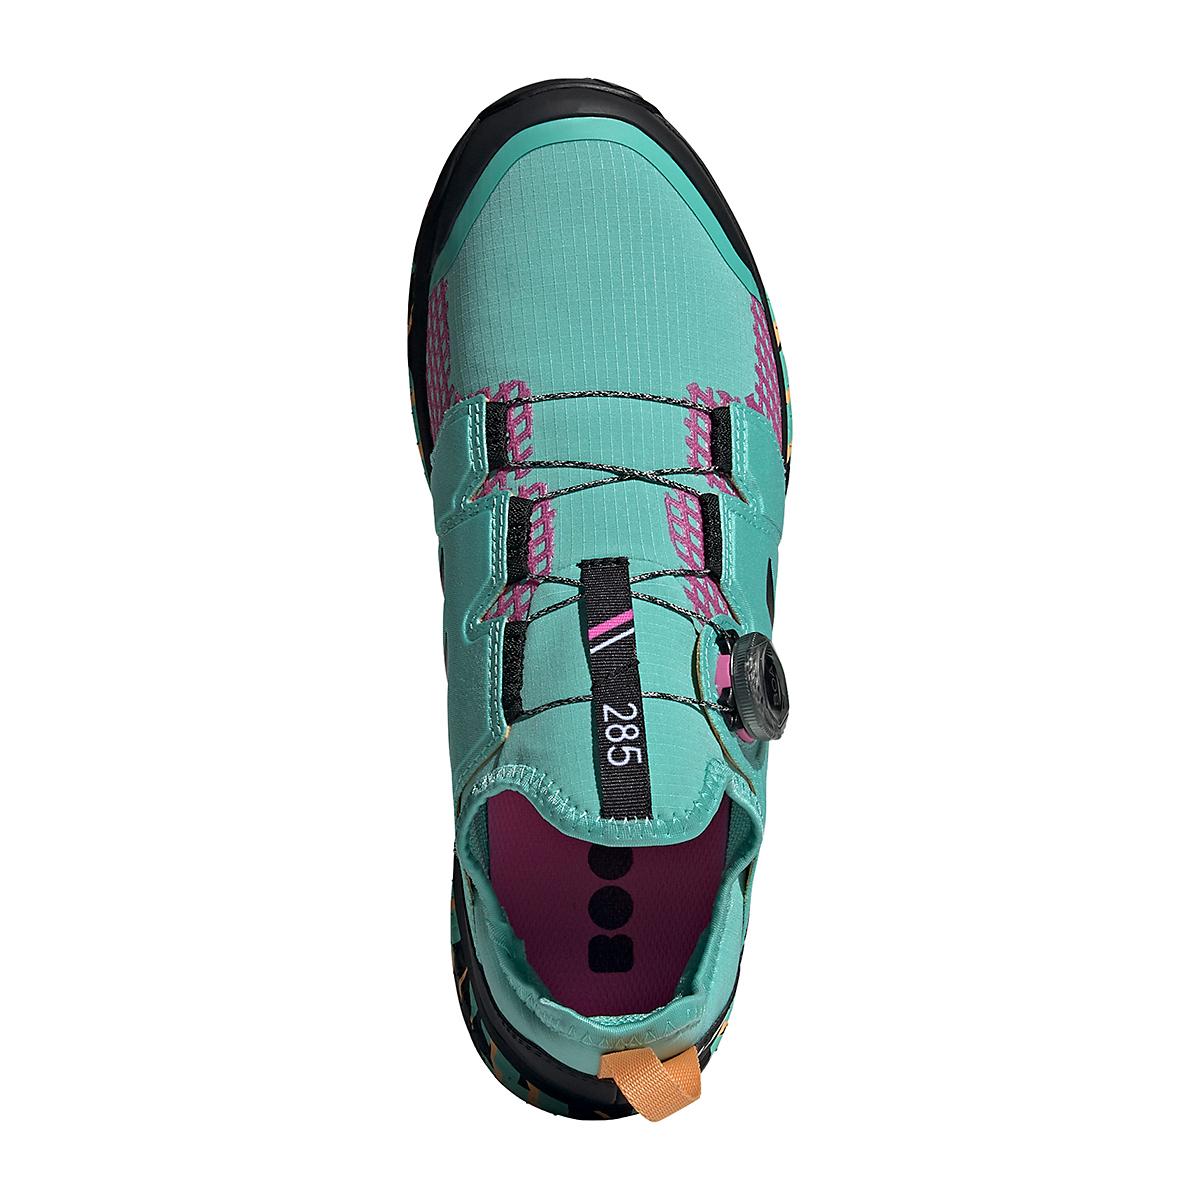 Men's Adidas Terrex Agravic BOA Trail Running Shoe - Color: Acid Mint/Core Black/Screaming Pink - Size: 6 - Width: Regular, Acid Mint/Core Black/Screaming Pink, large, image 6